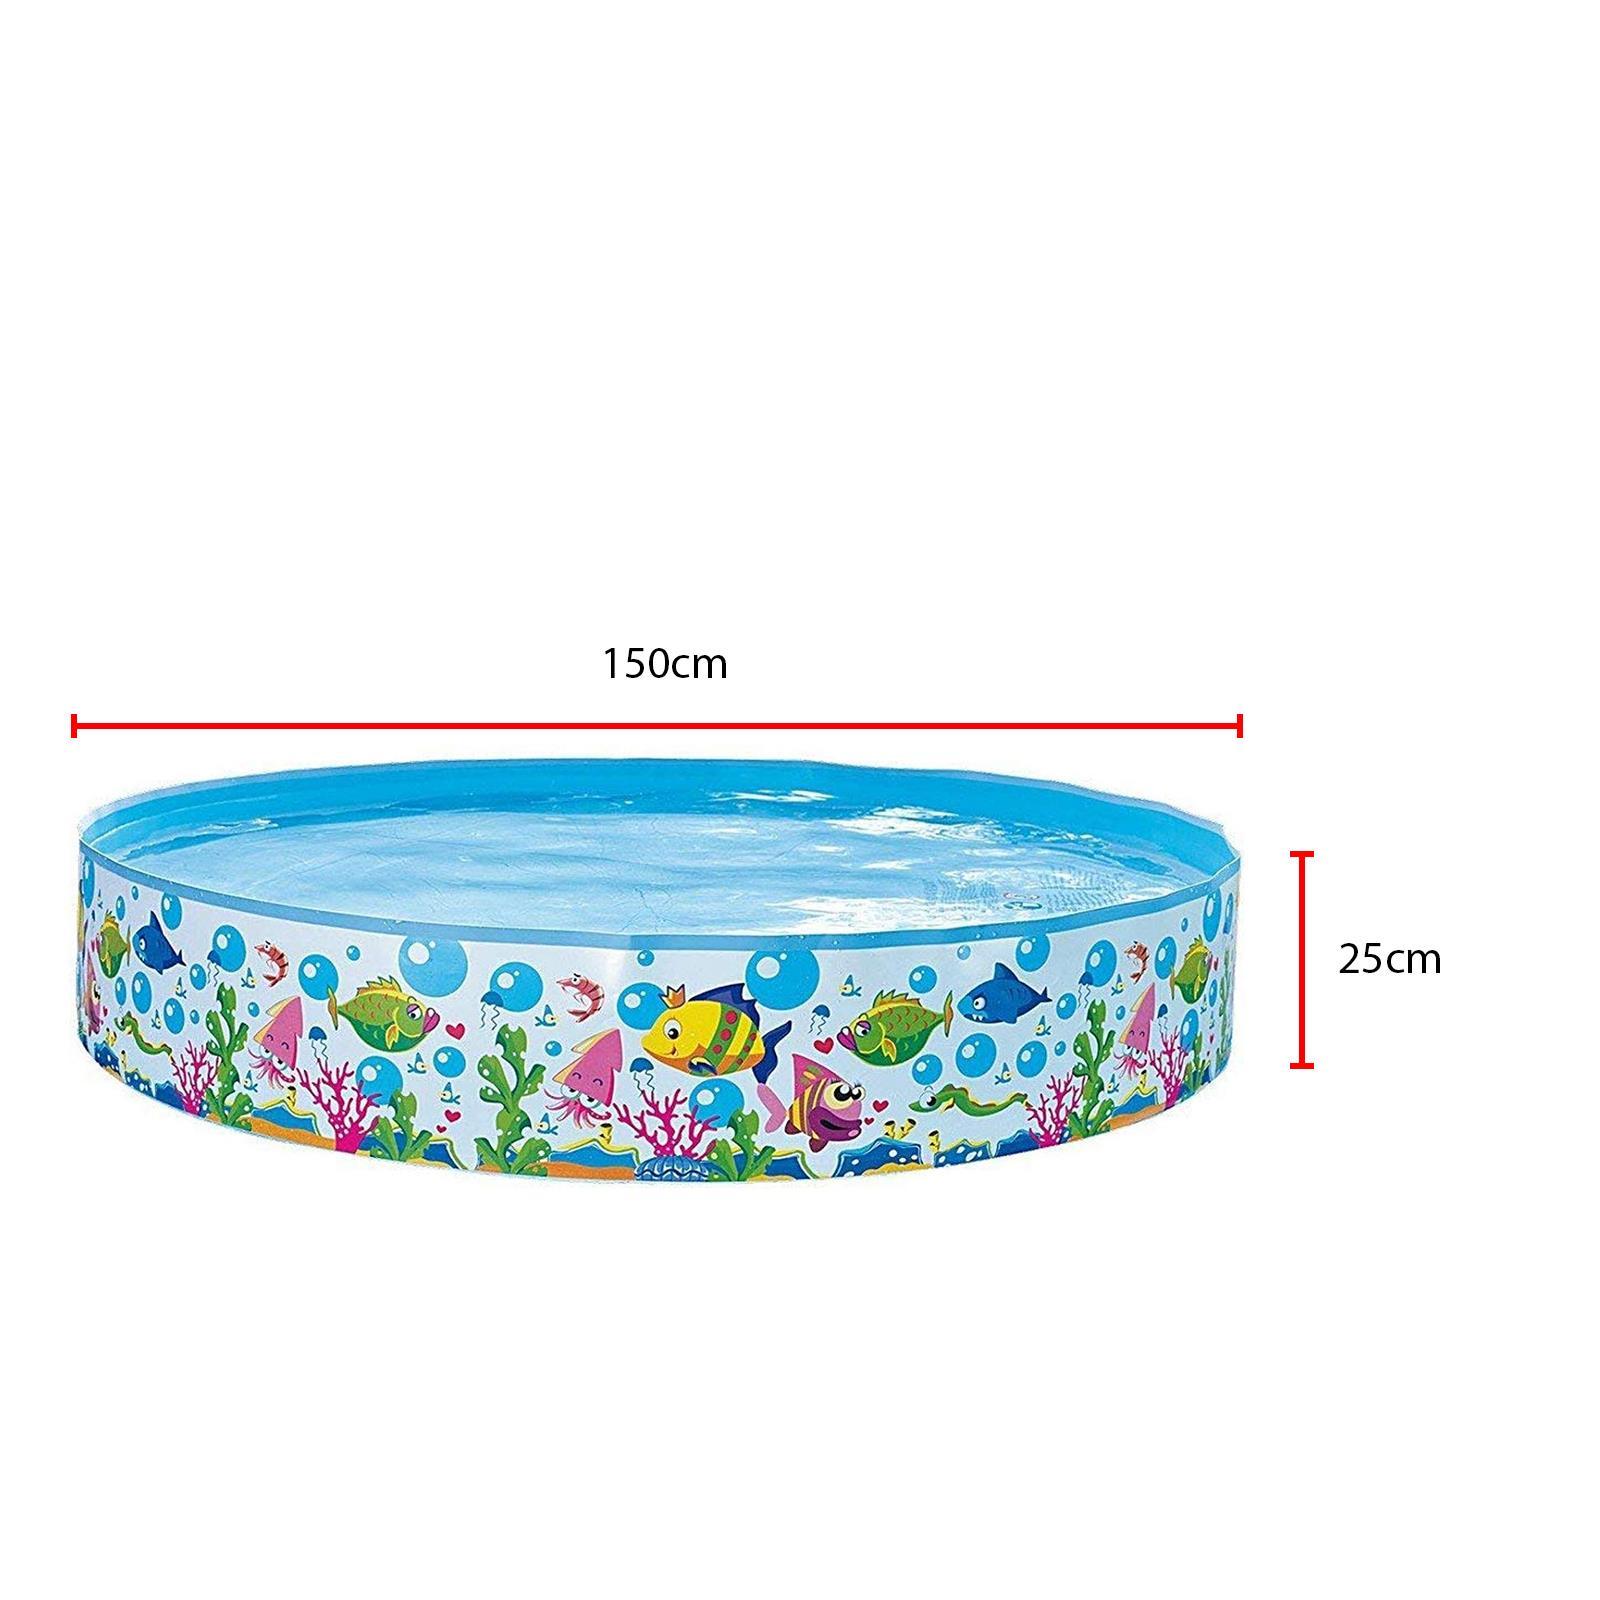 Centro-De-Juegos-De-Natacion-Ninos-Ridgid-Pared-piscina-infantil-Mar-Vida-al-Aire-Libre-diversion miniatura 11